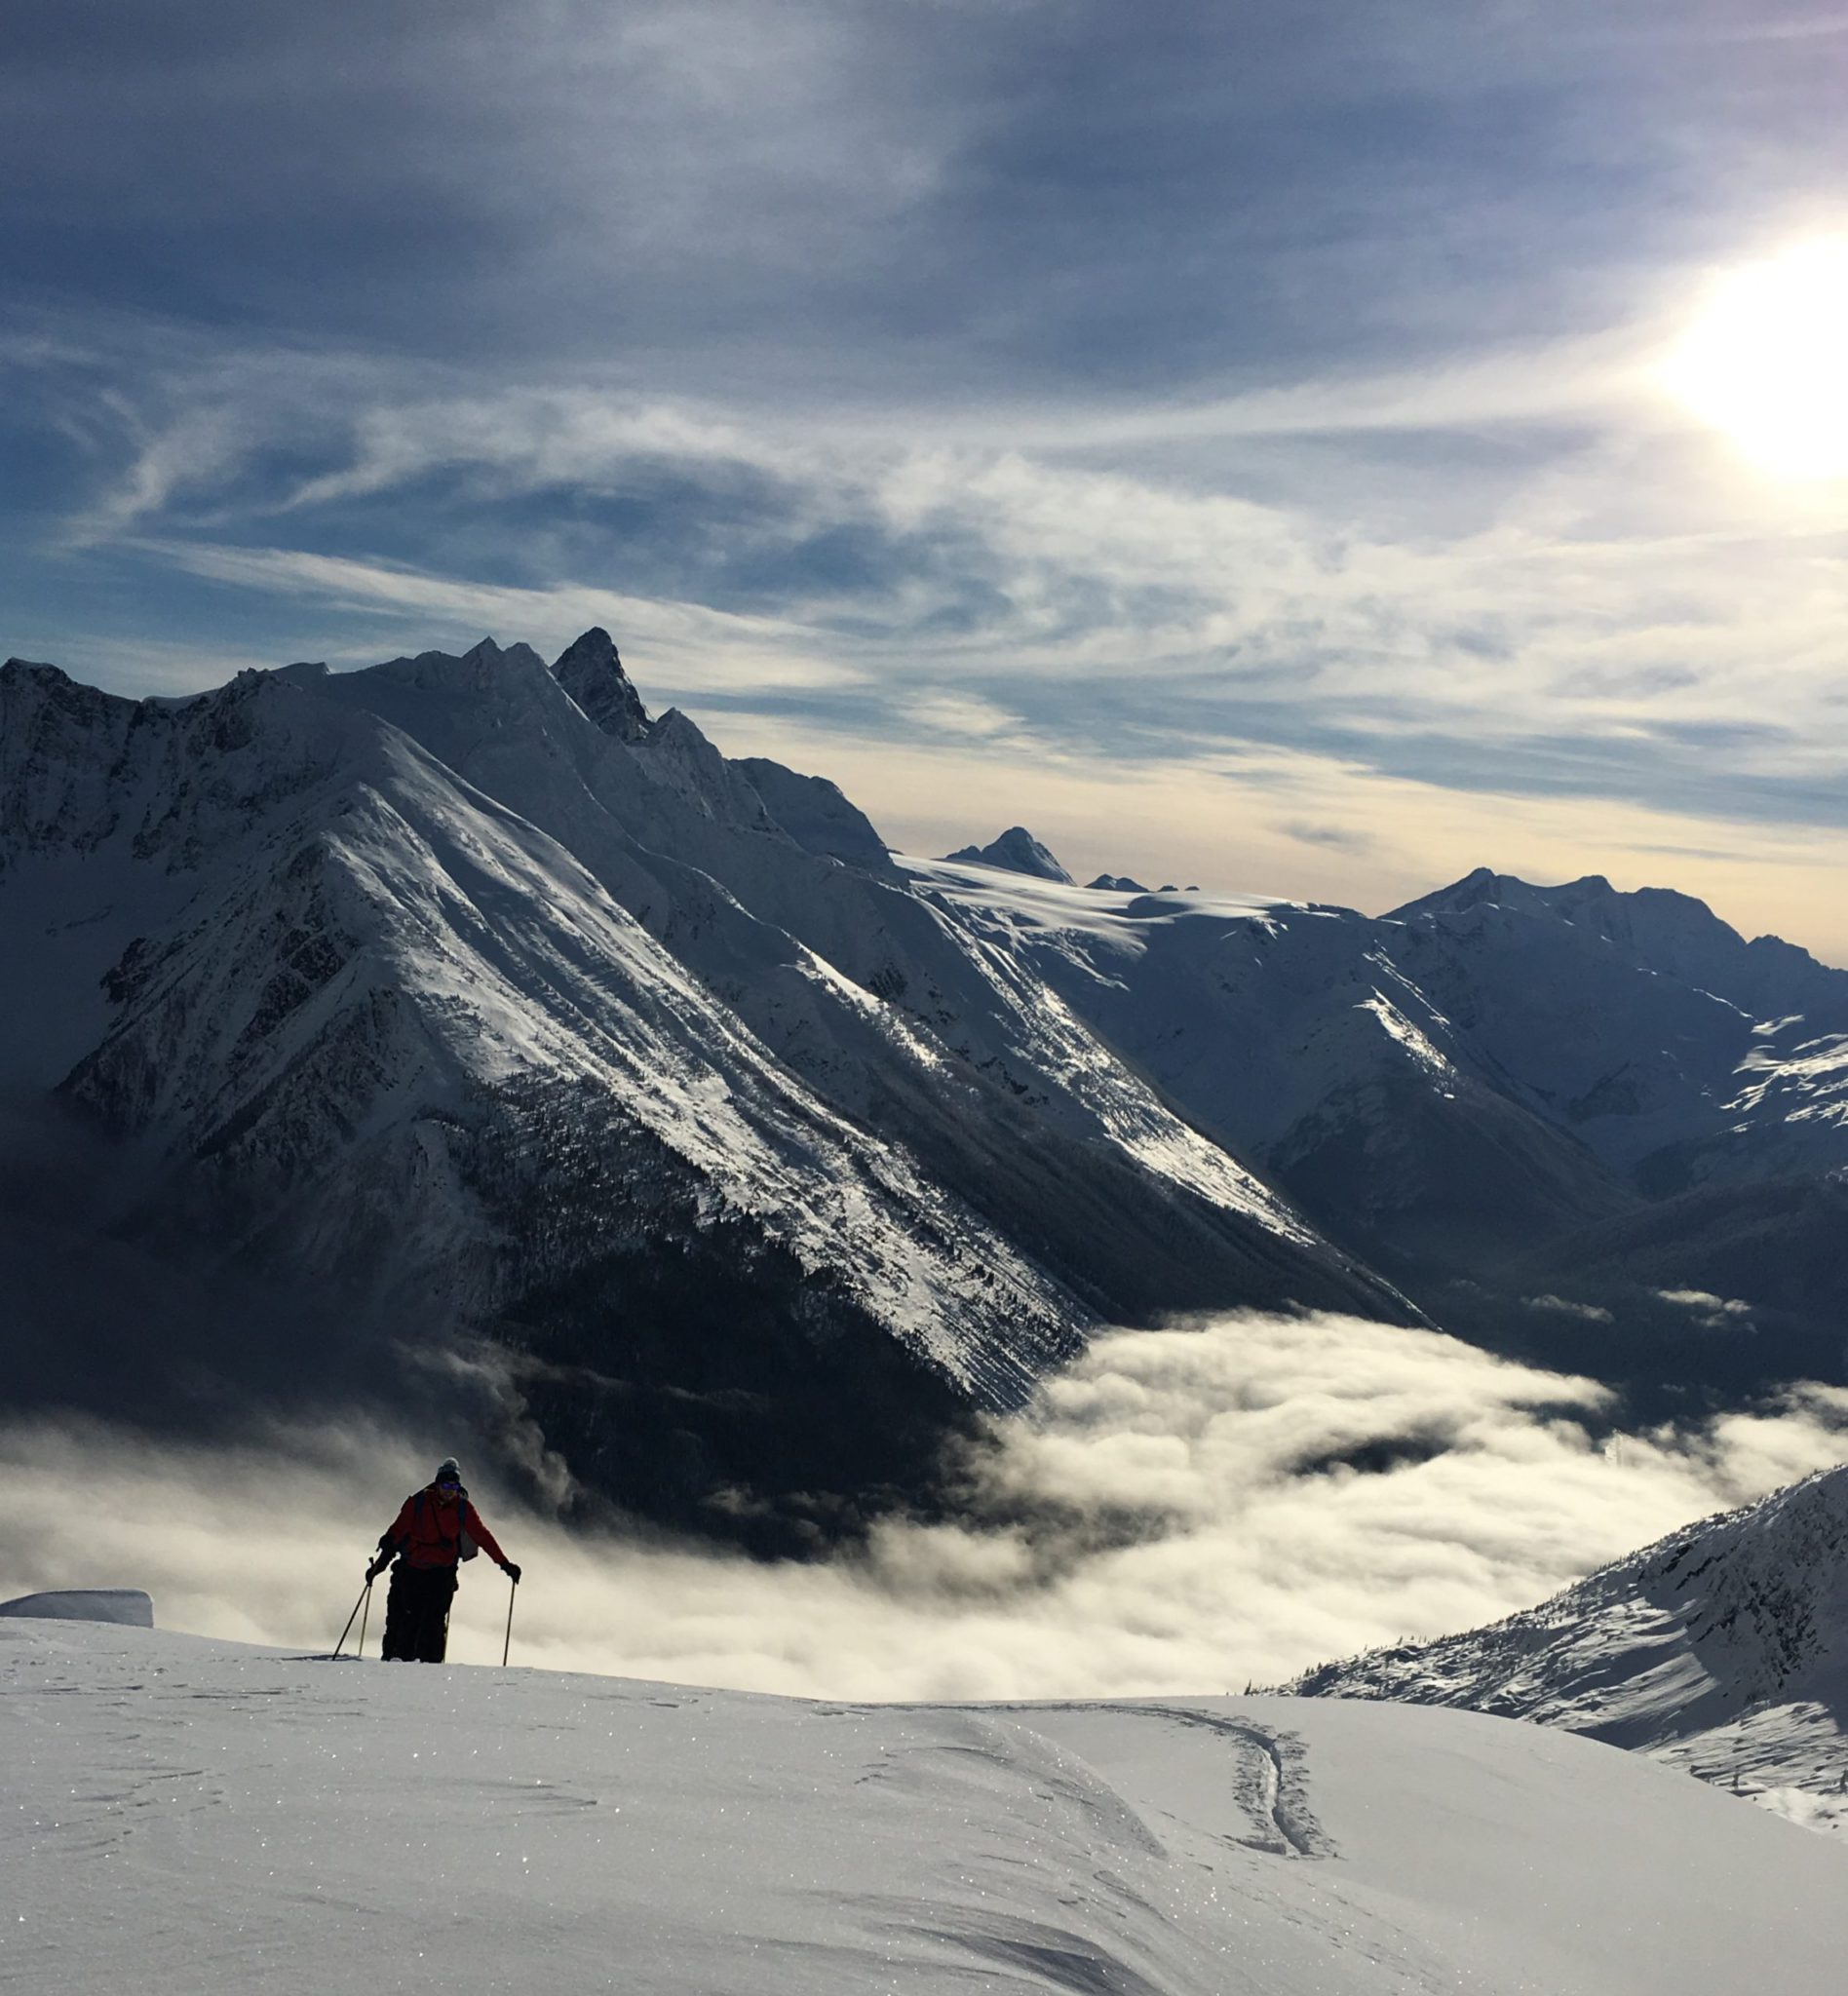 Canada ski touring: Freeride skiing holiday in British Columbia